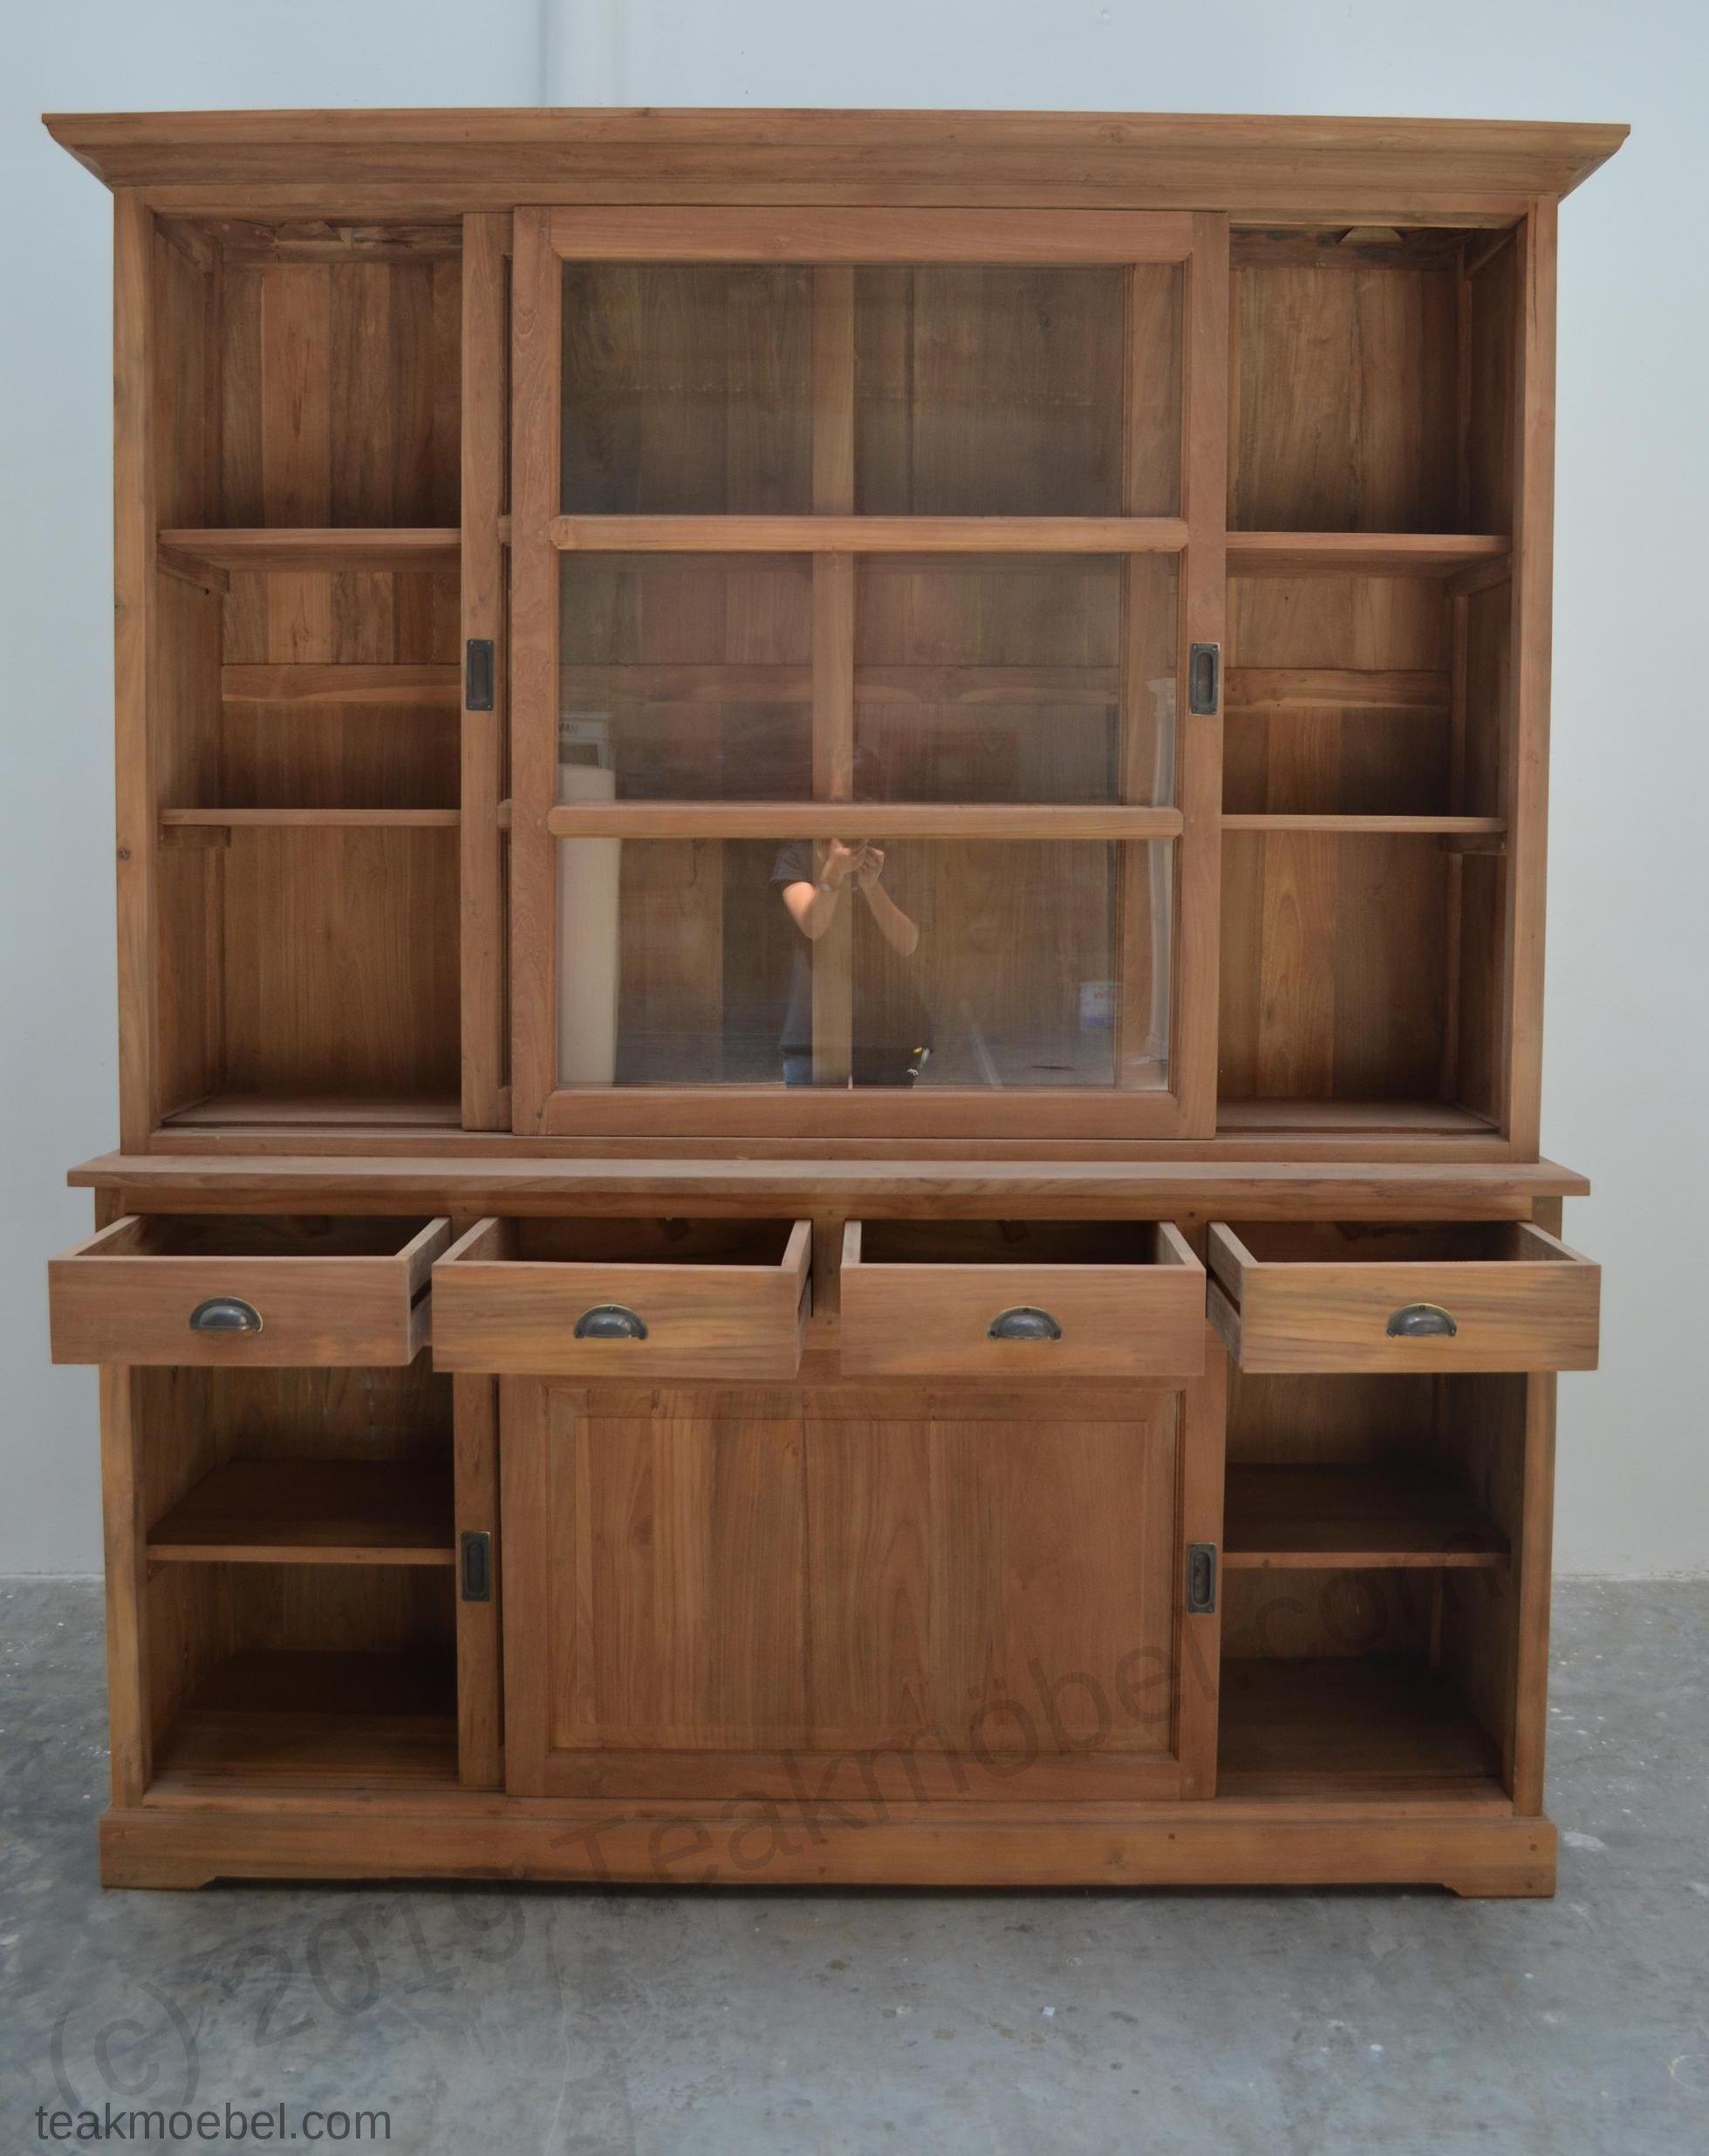 teak buffetschrank 180cm. Black Bedroom Furniture Sets. Home Design Ideas